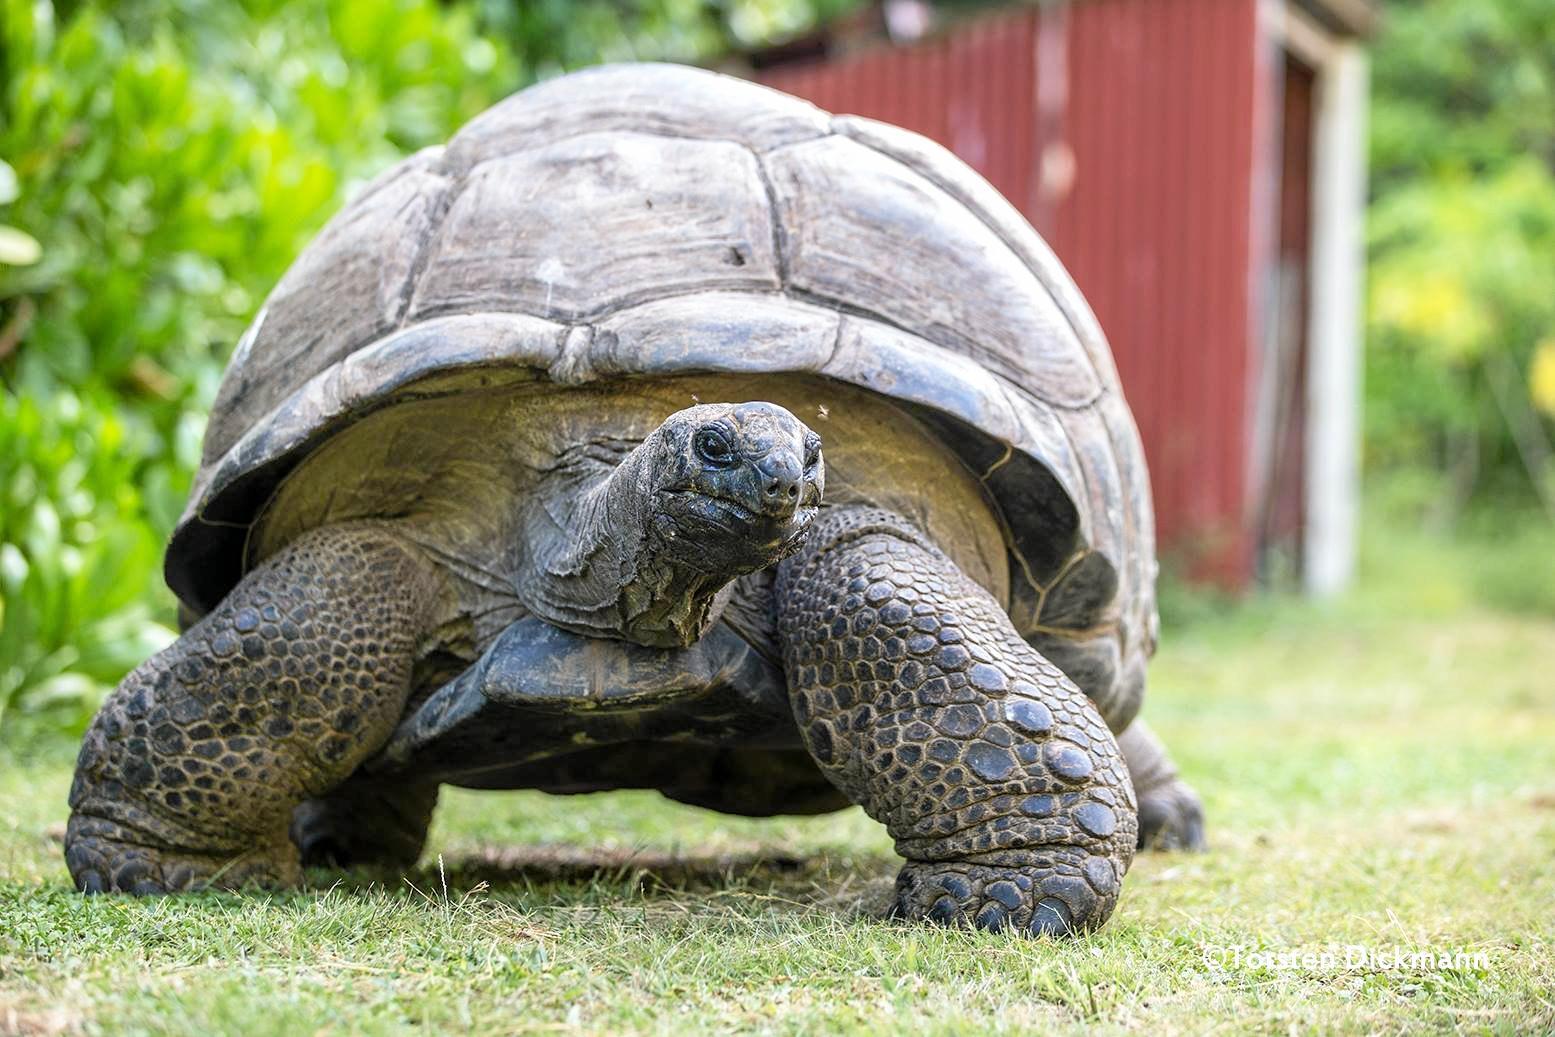 SUN ISLANDS: The giant tortoises of the Seychelles Islands.